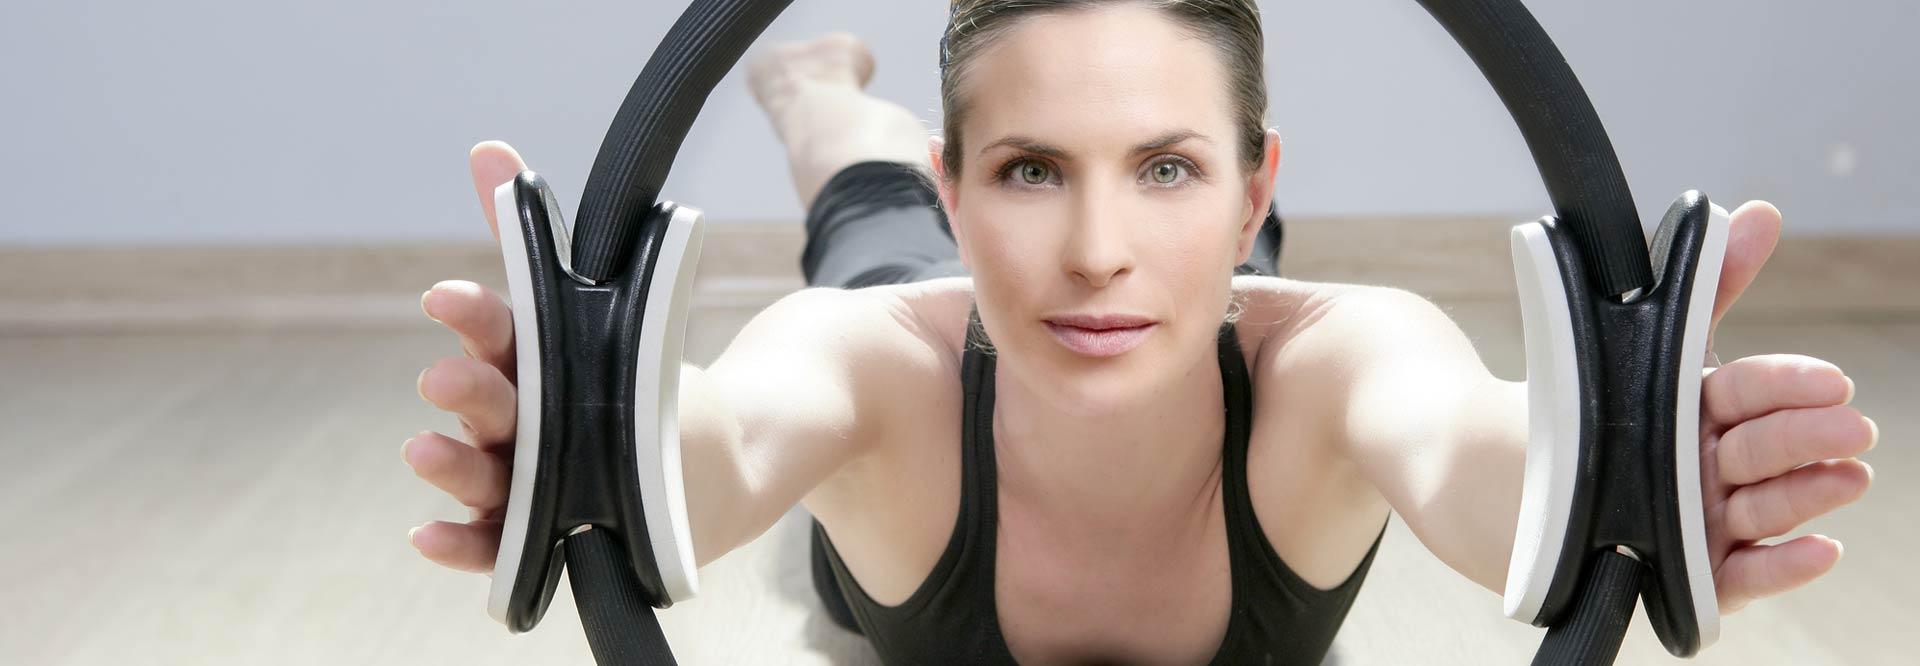 Pilates Flessibilità